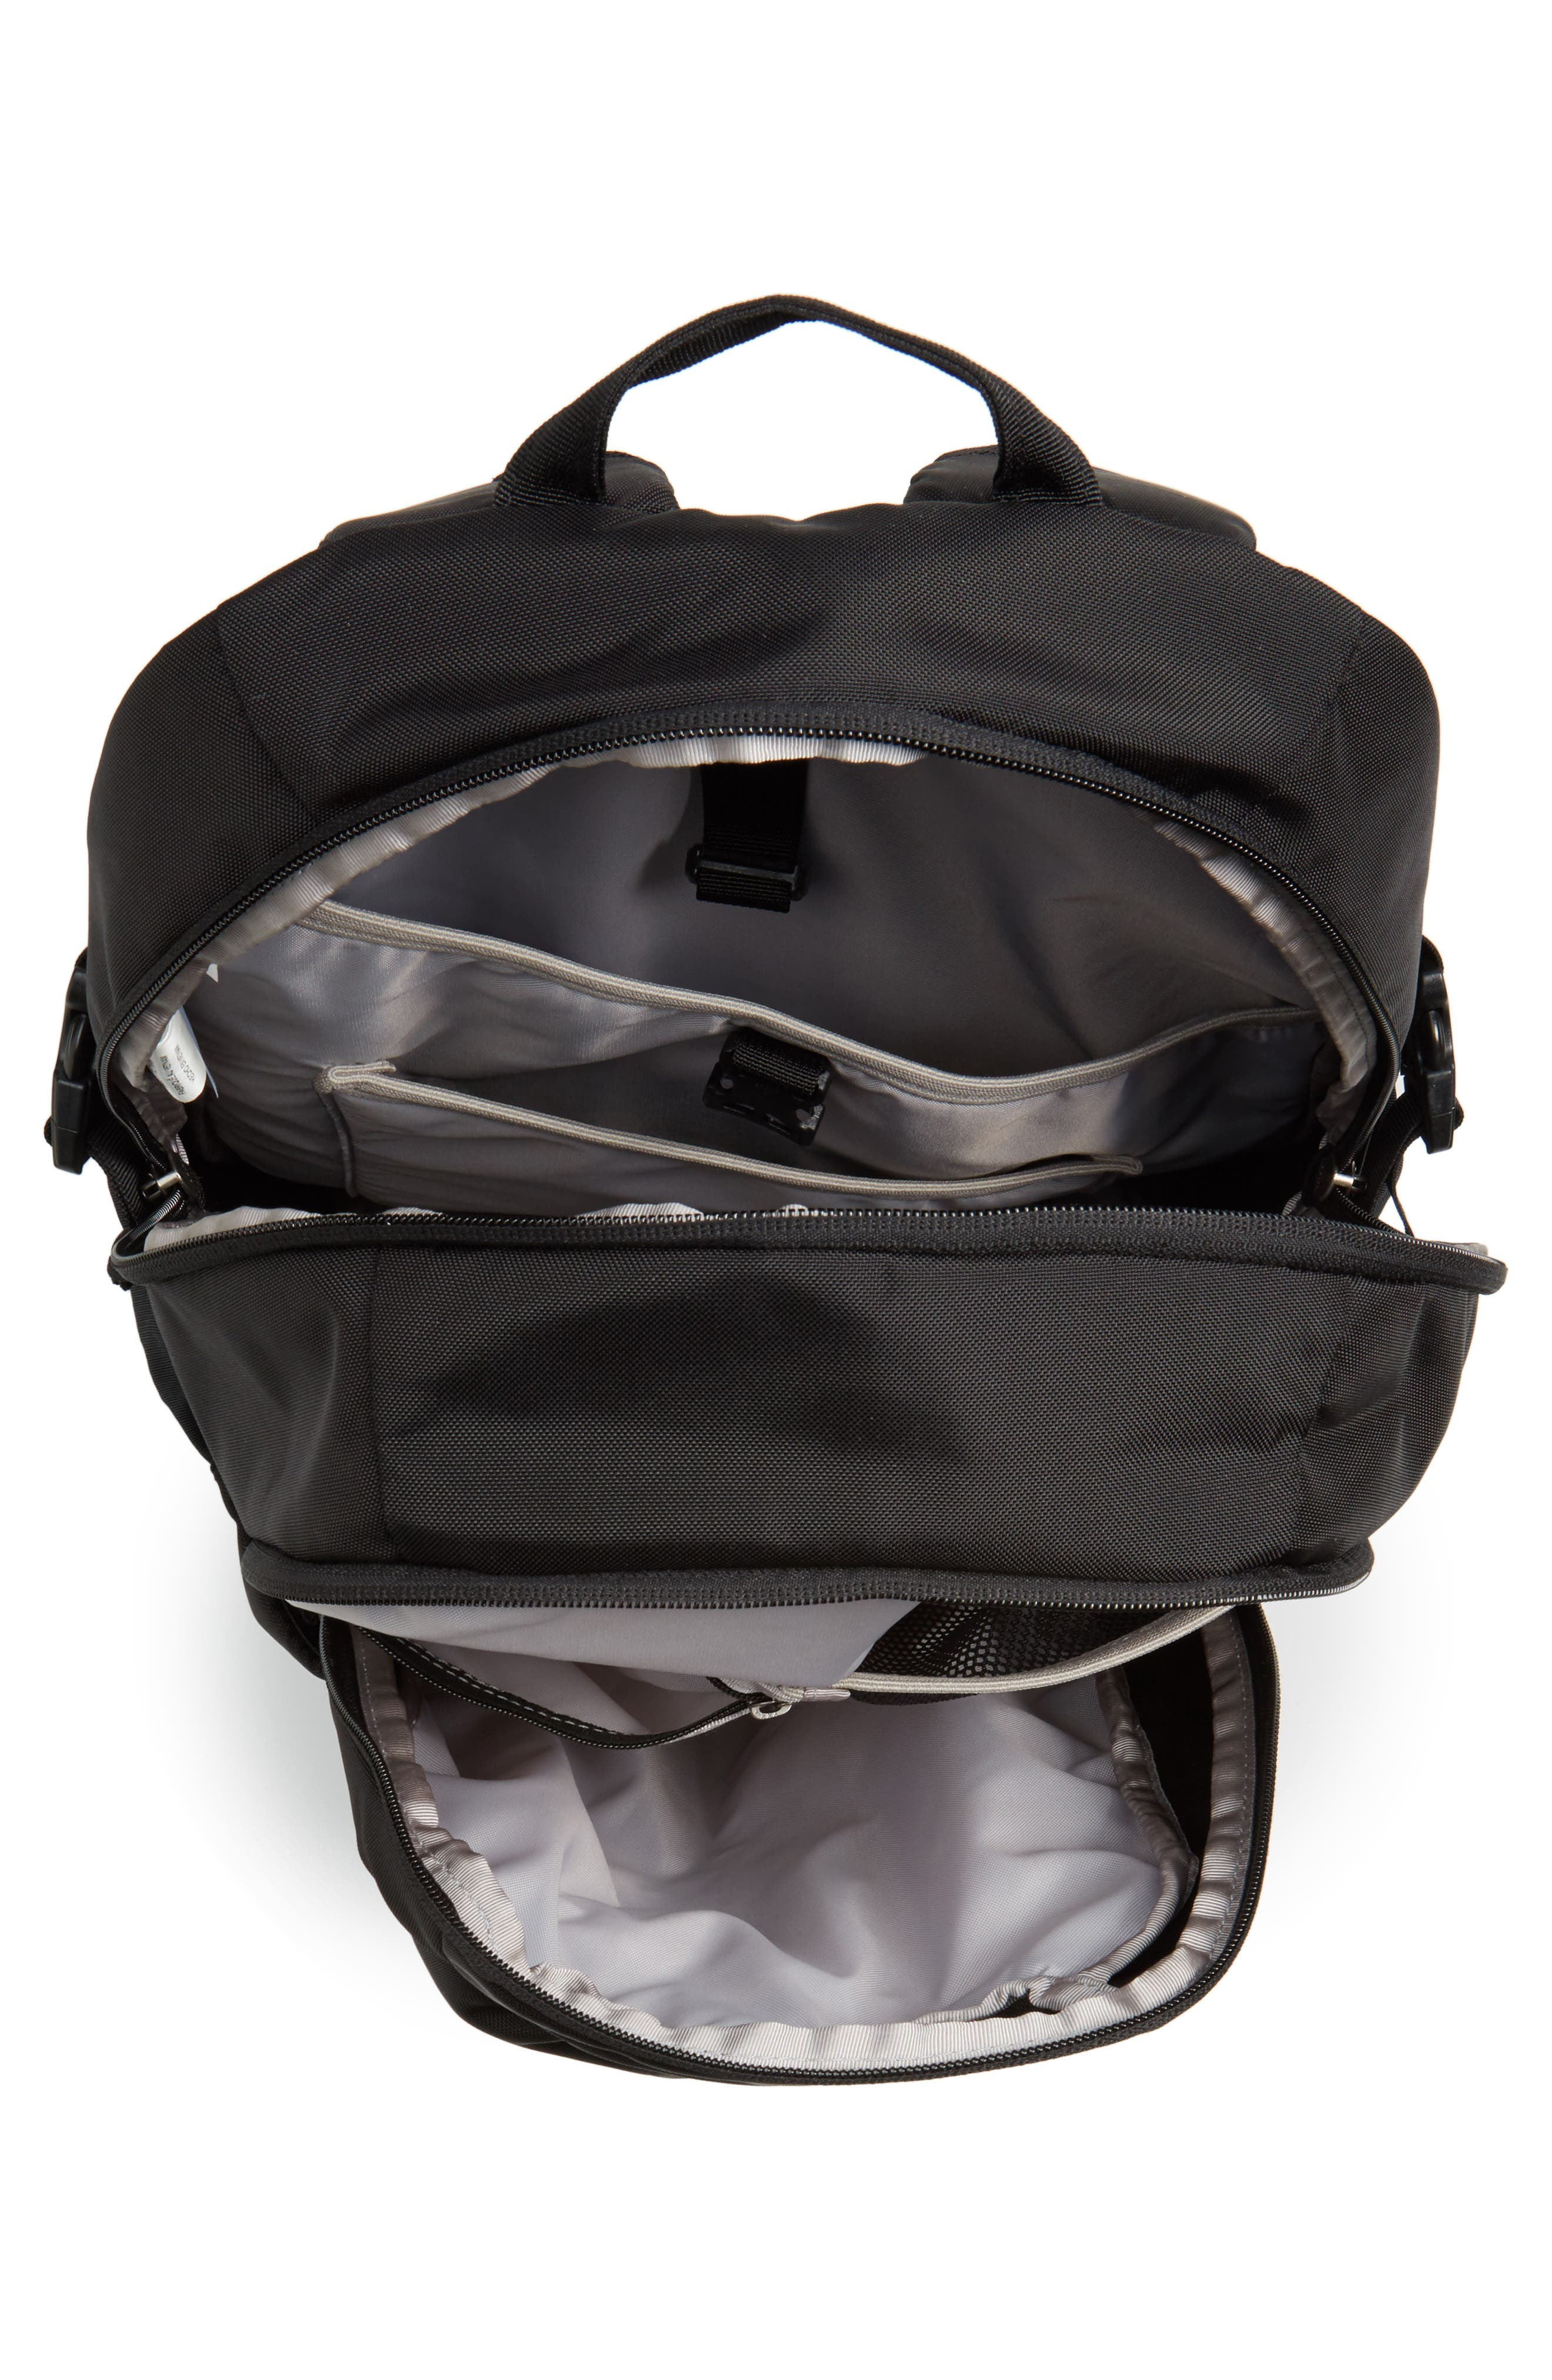 PATAGONIA, Refugio 28-Liter Backpack, Alternate thumbnail 5, color, 001